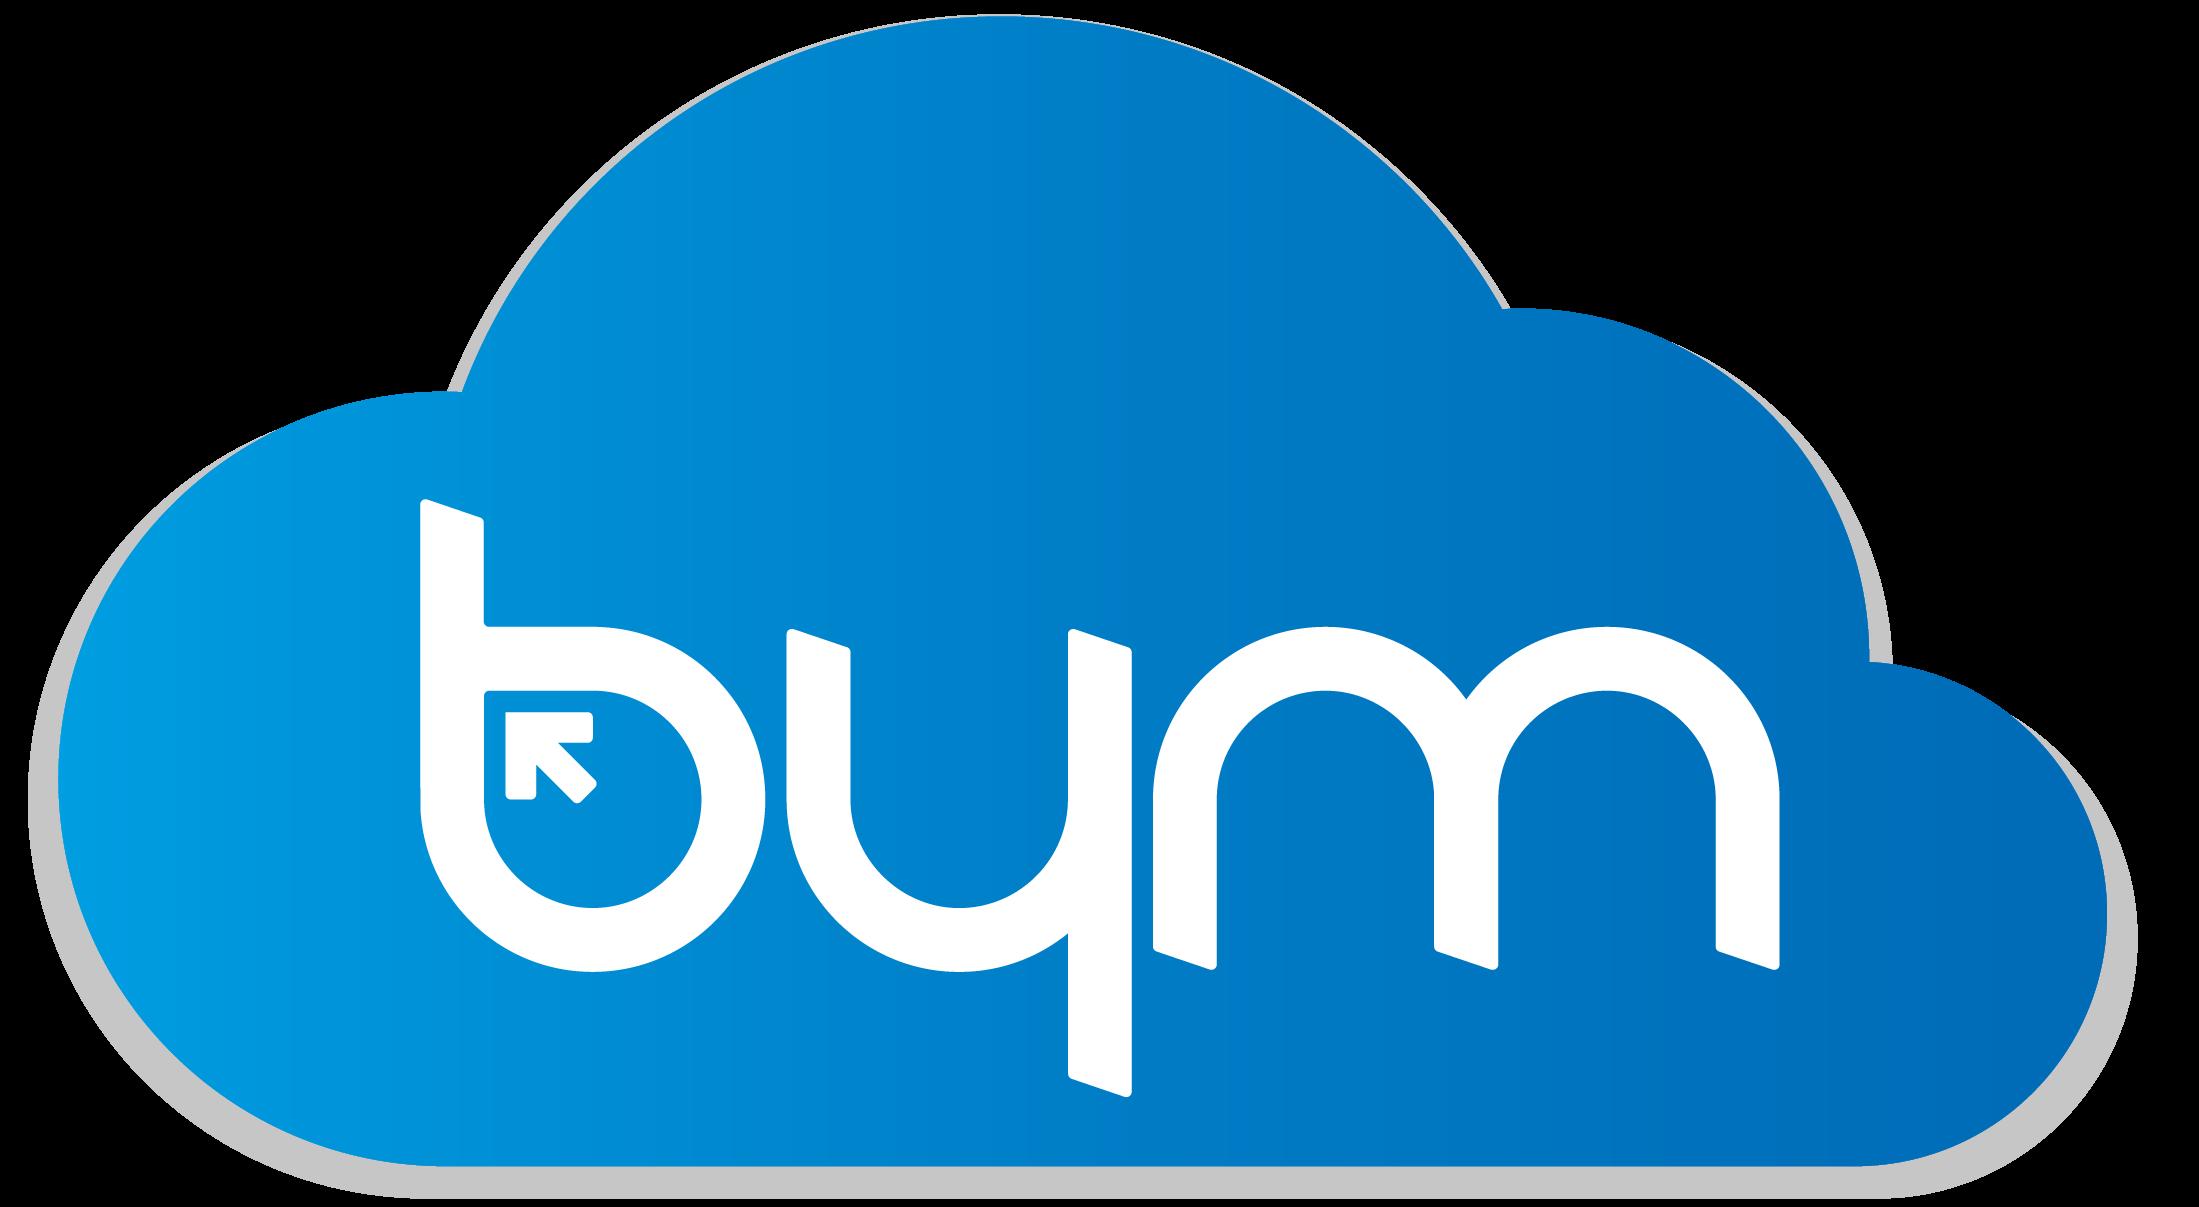 BYM Yazılım,BYM Yazılım Sanayi ve Ticaret A.Ş.